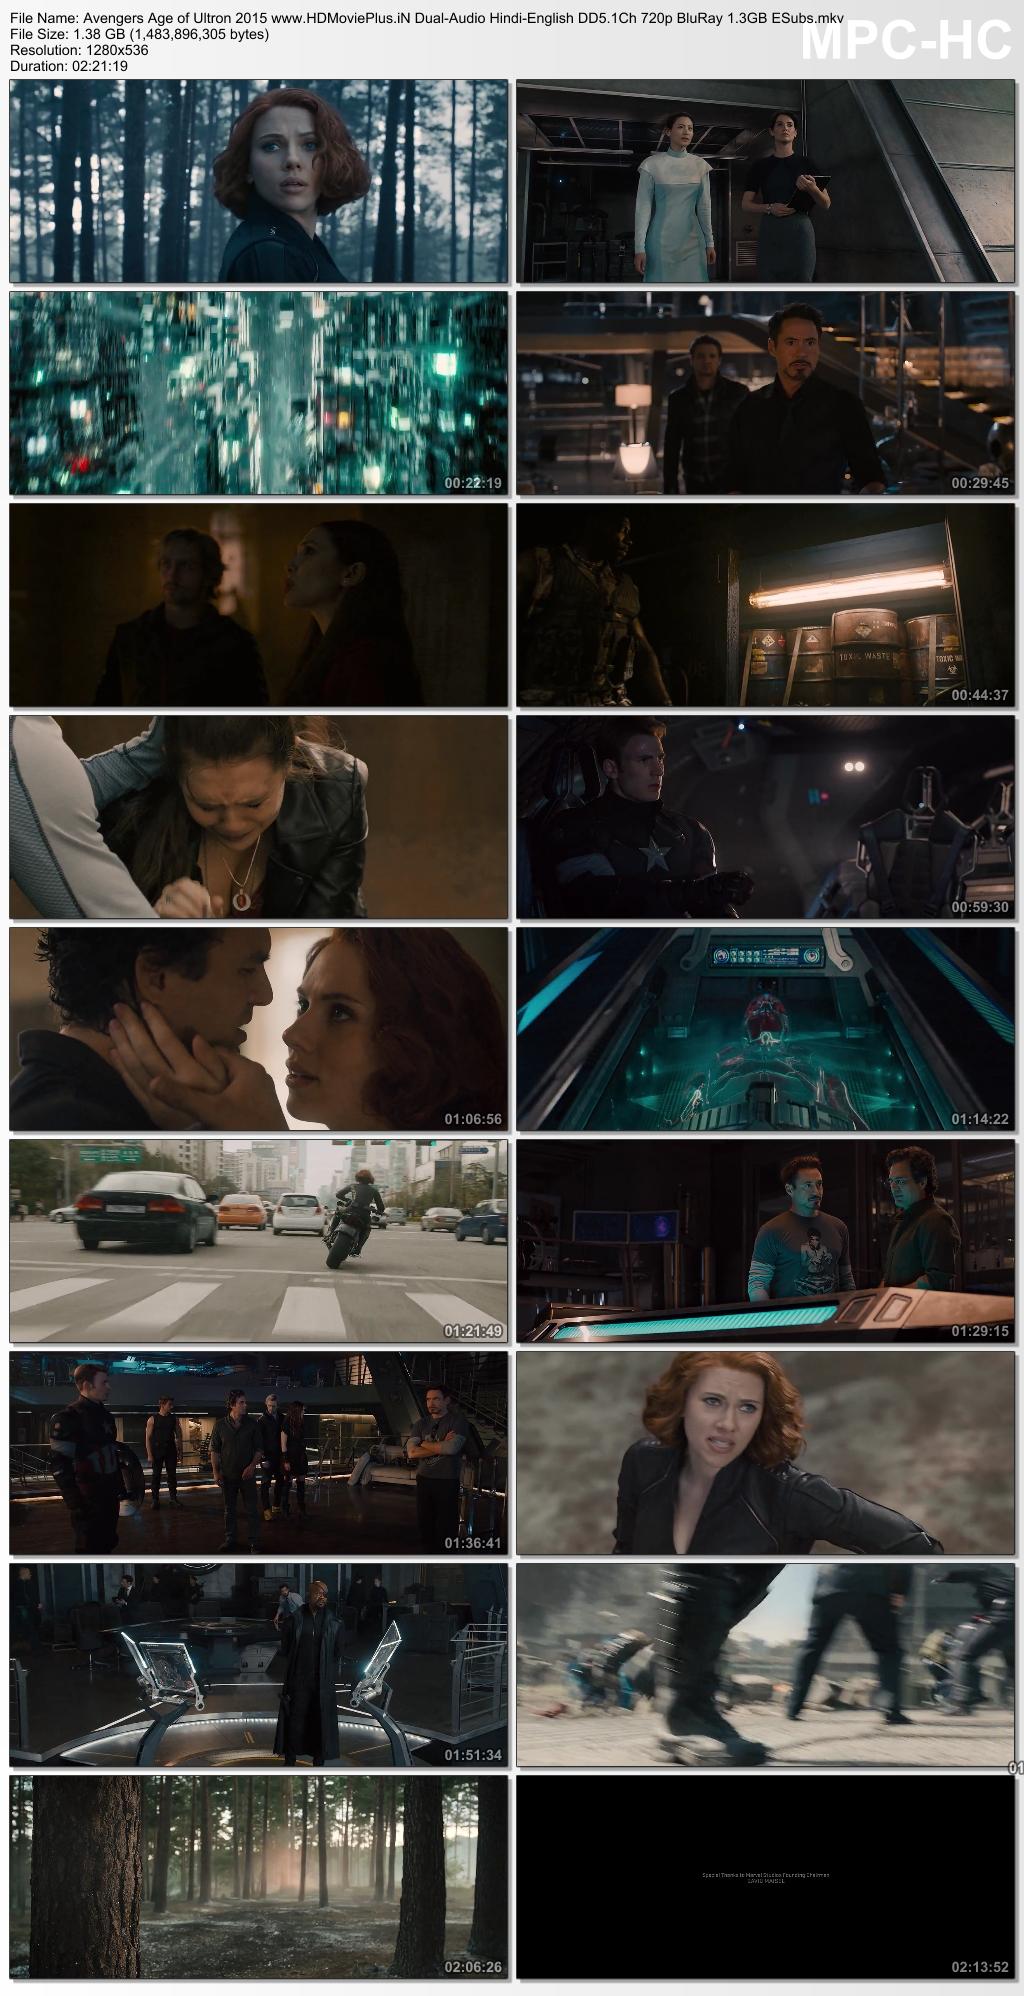 Avengers: Age of Ultron 2015 Dual Audio